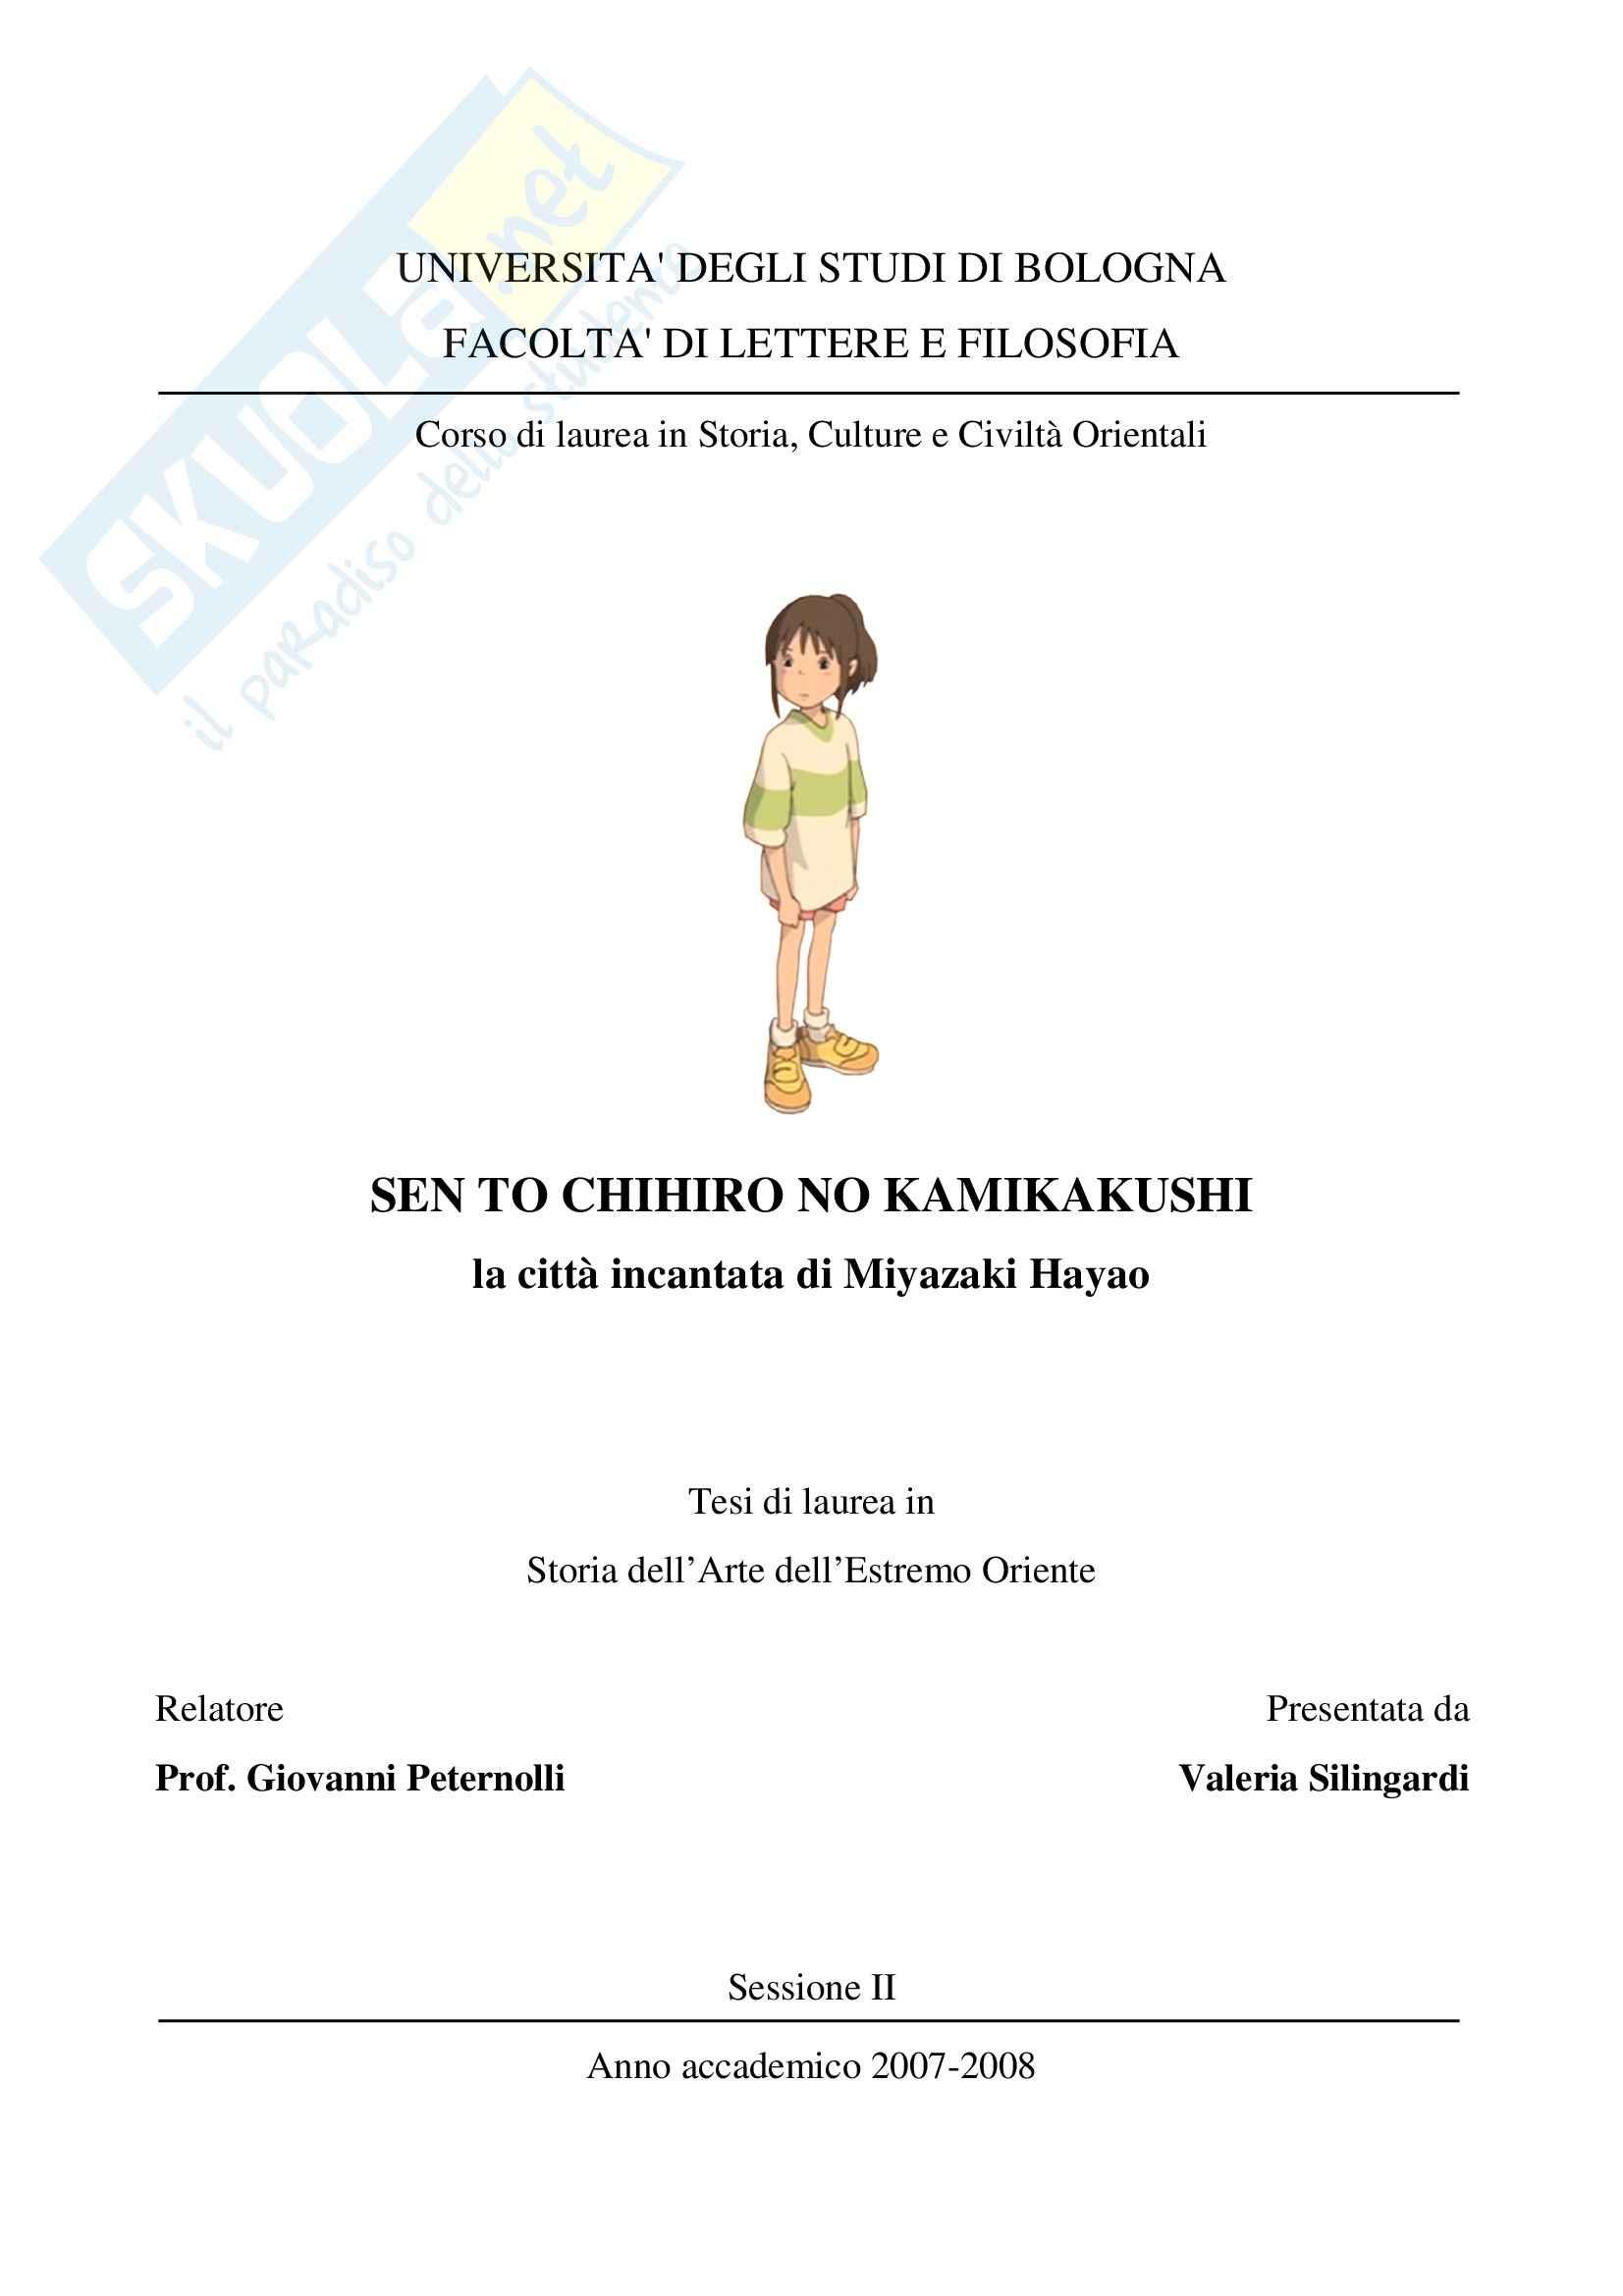 Tesi - La città incantata di Miyazaki Hayao